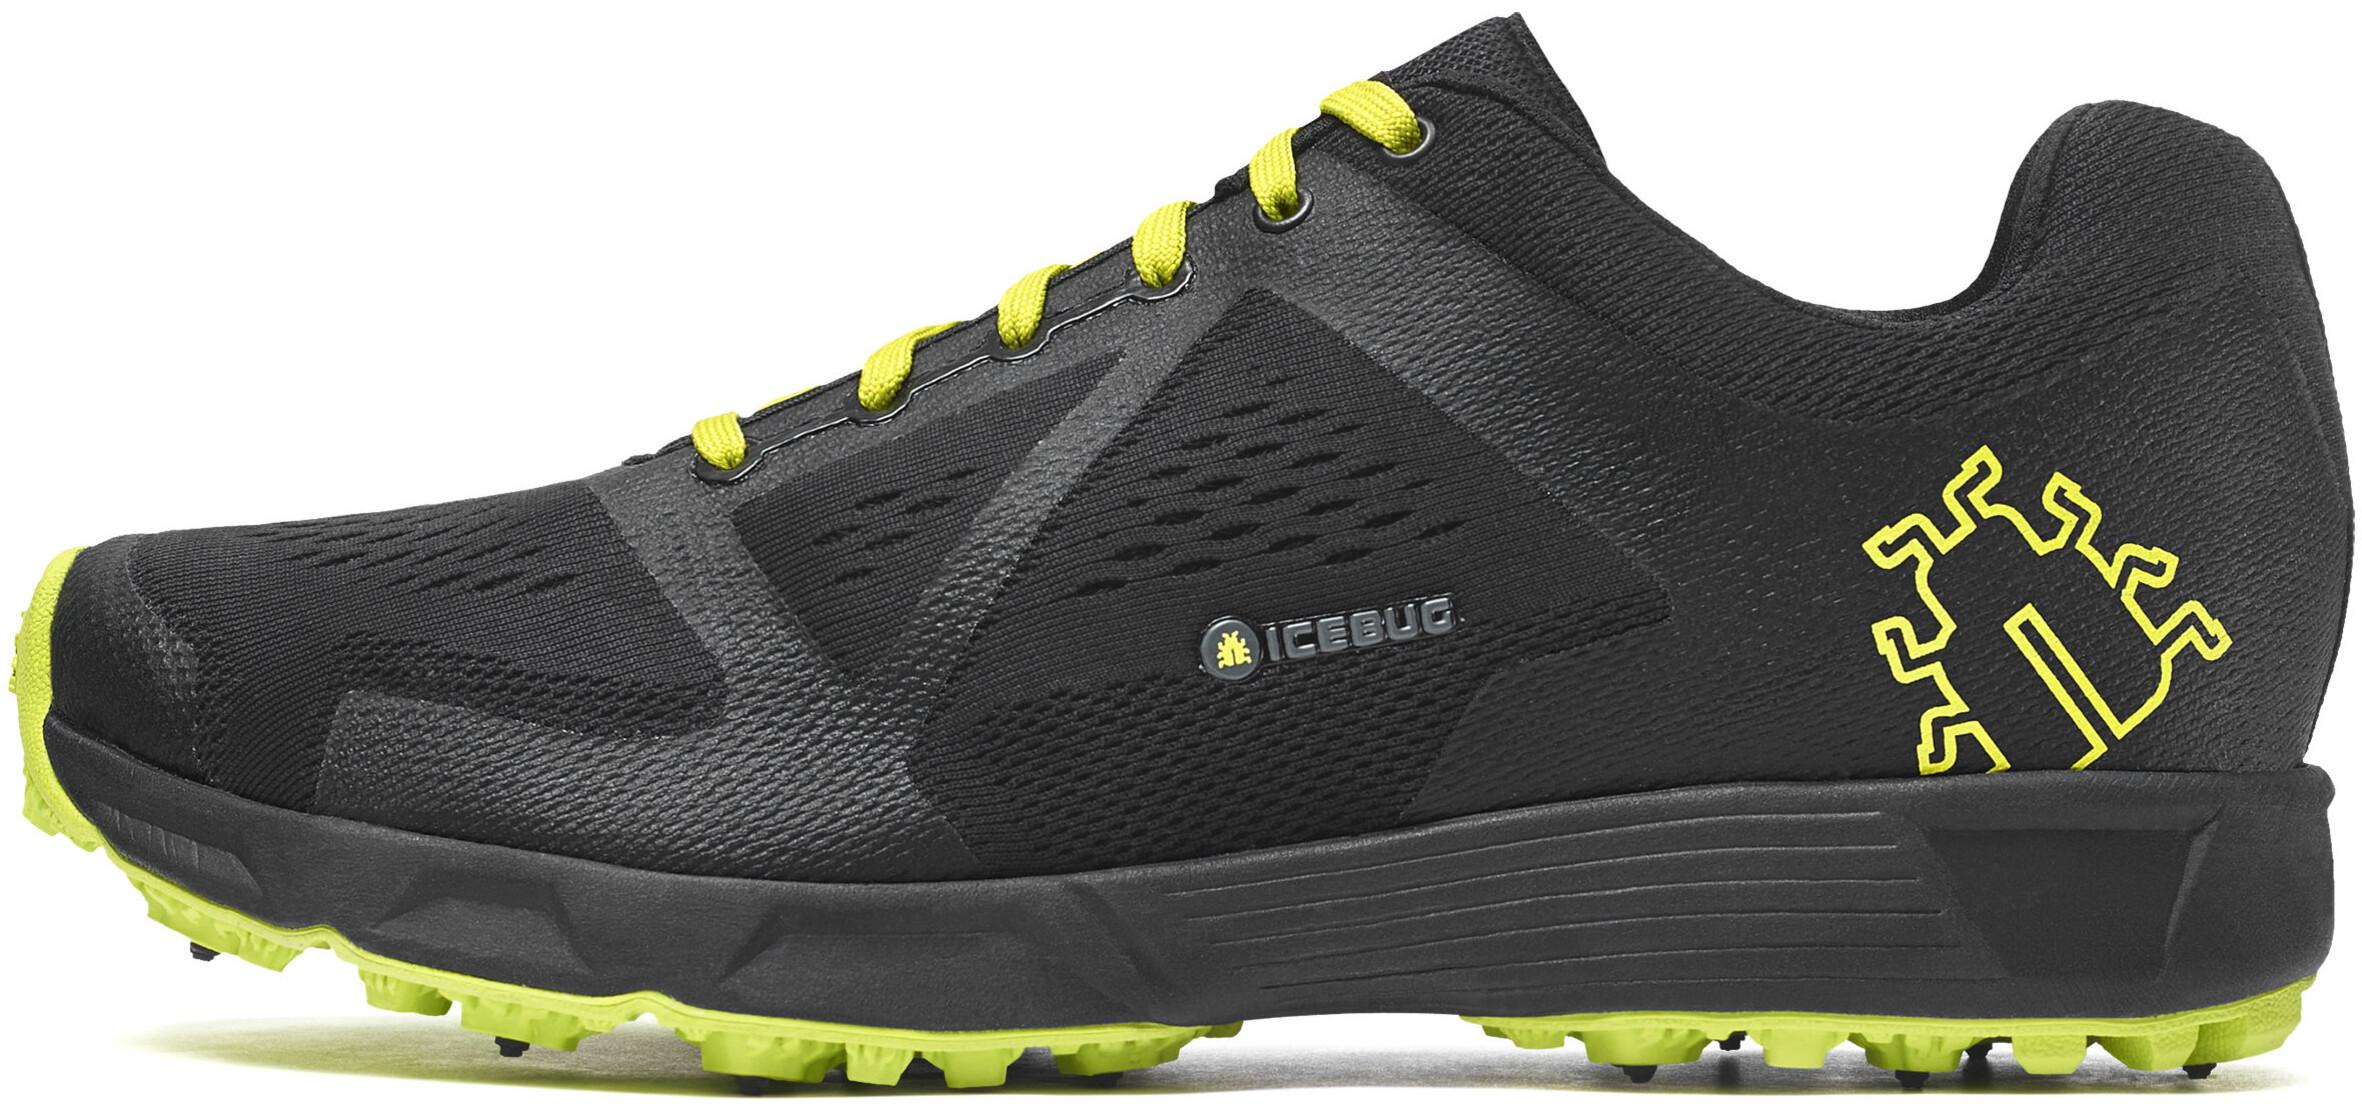 a3d2b8b0780 Icebug W´s Kayi3 BUGrip Shoes Black/DkLime - addnature.com